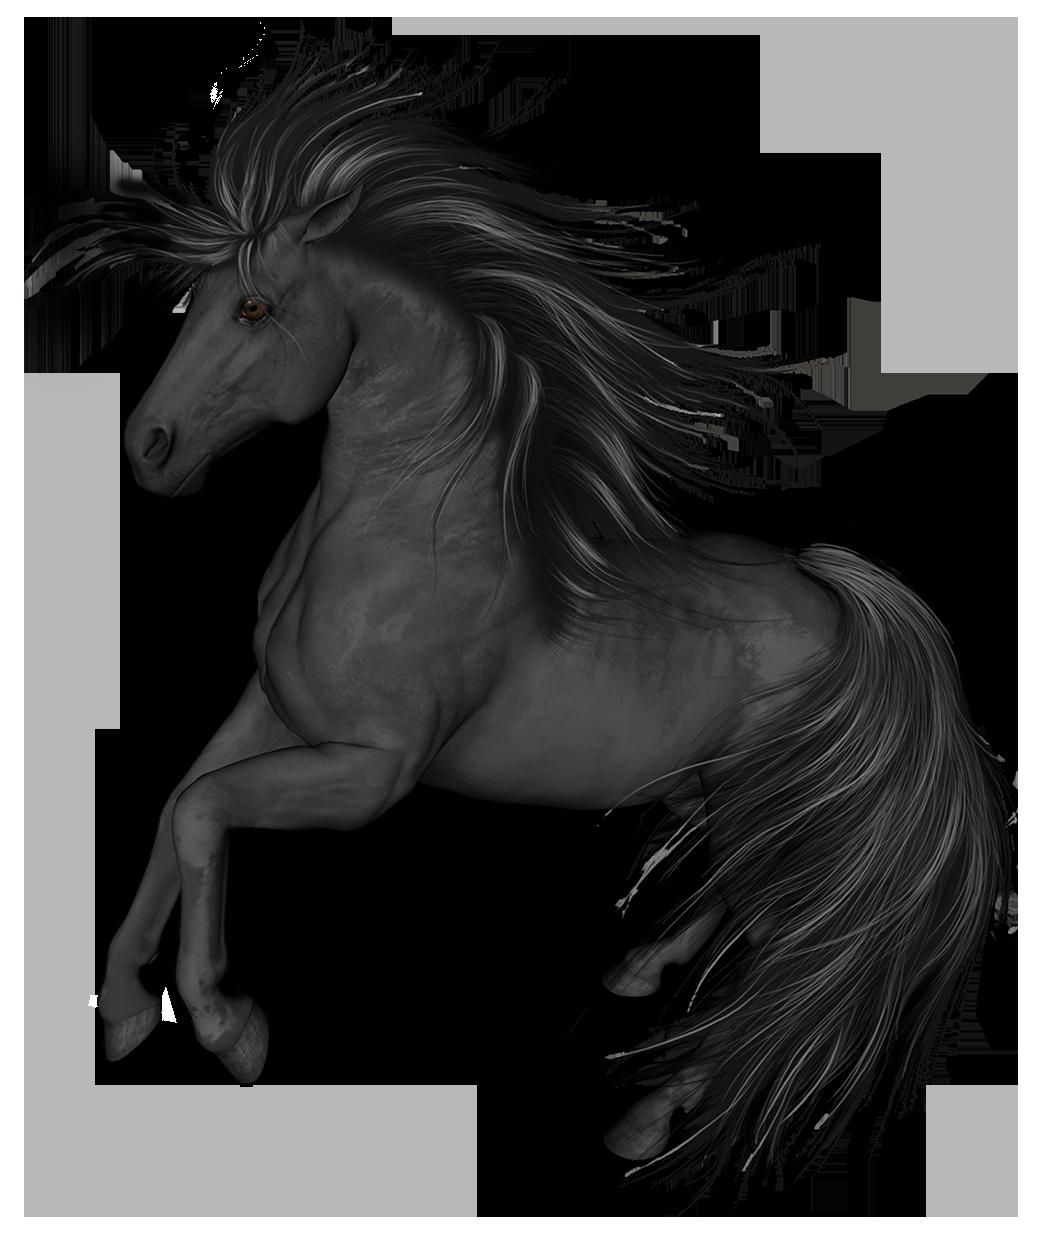 Dark house clipart clip art royalty free download Black Horse PNG Clip Art - Best WEB Clipart clip art royalty free download